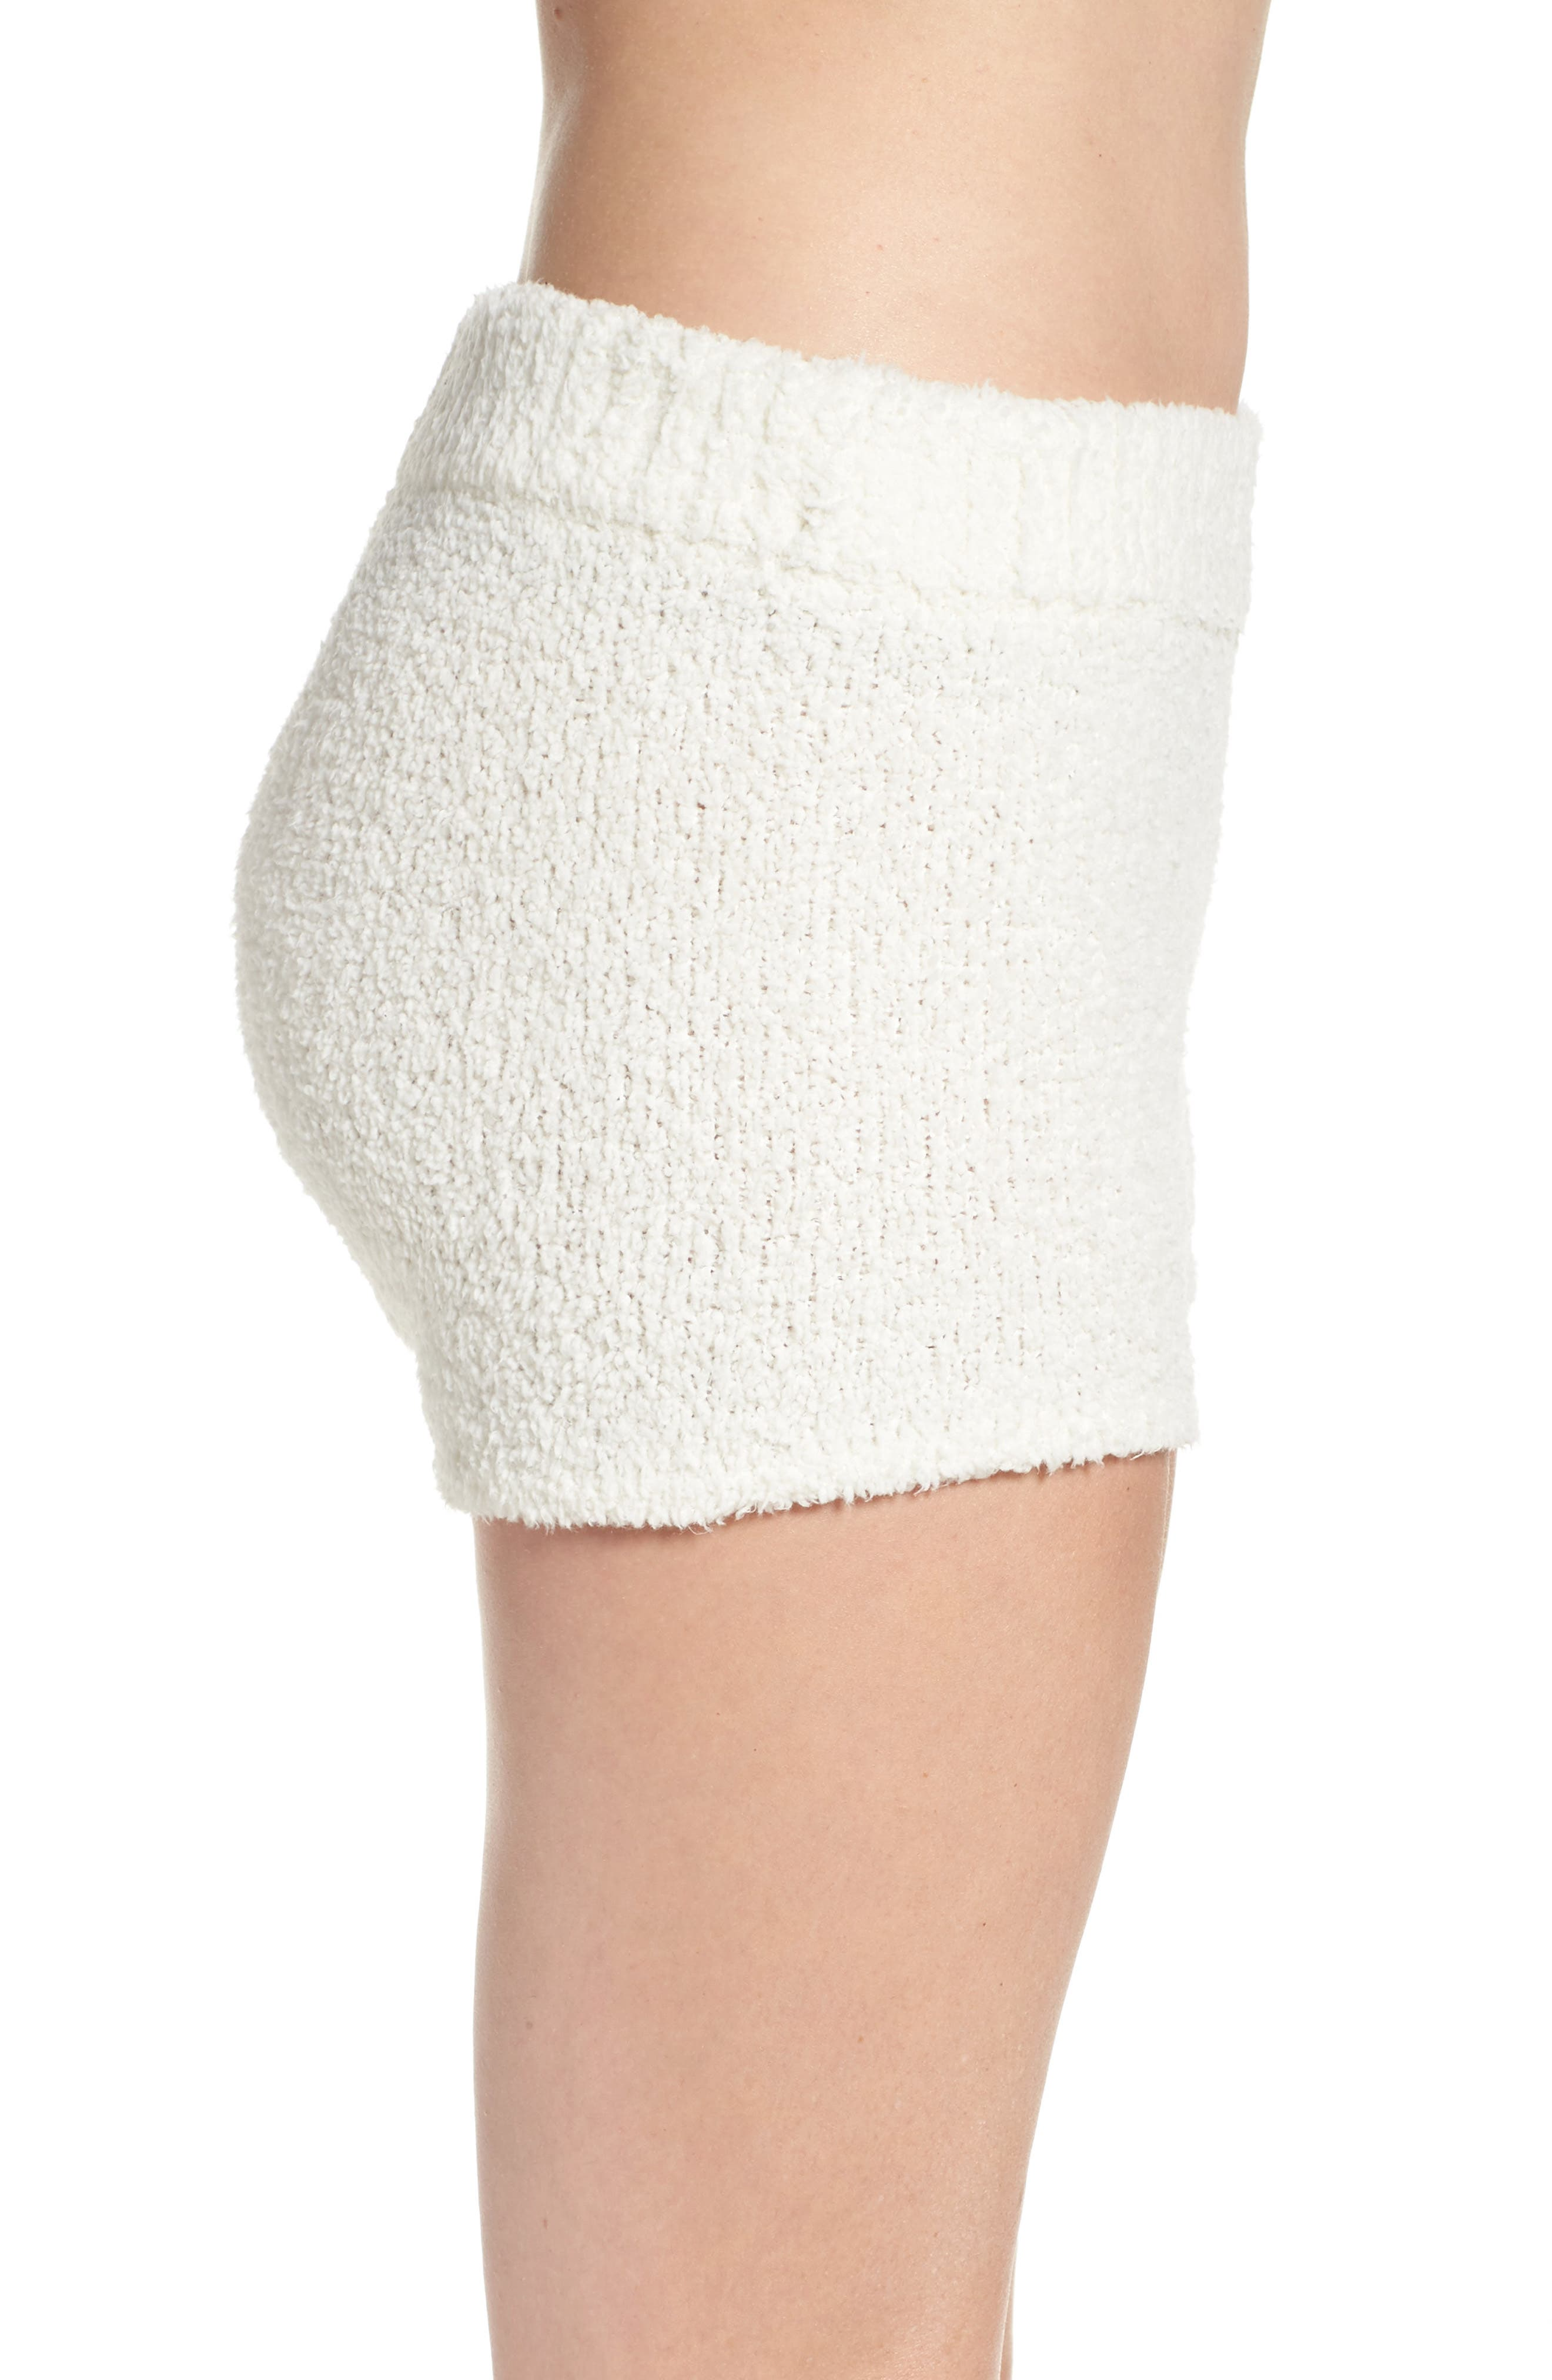 Sweater Knit Pajama Shorts,                             Alternate thumbnail 3, color,                             900